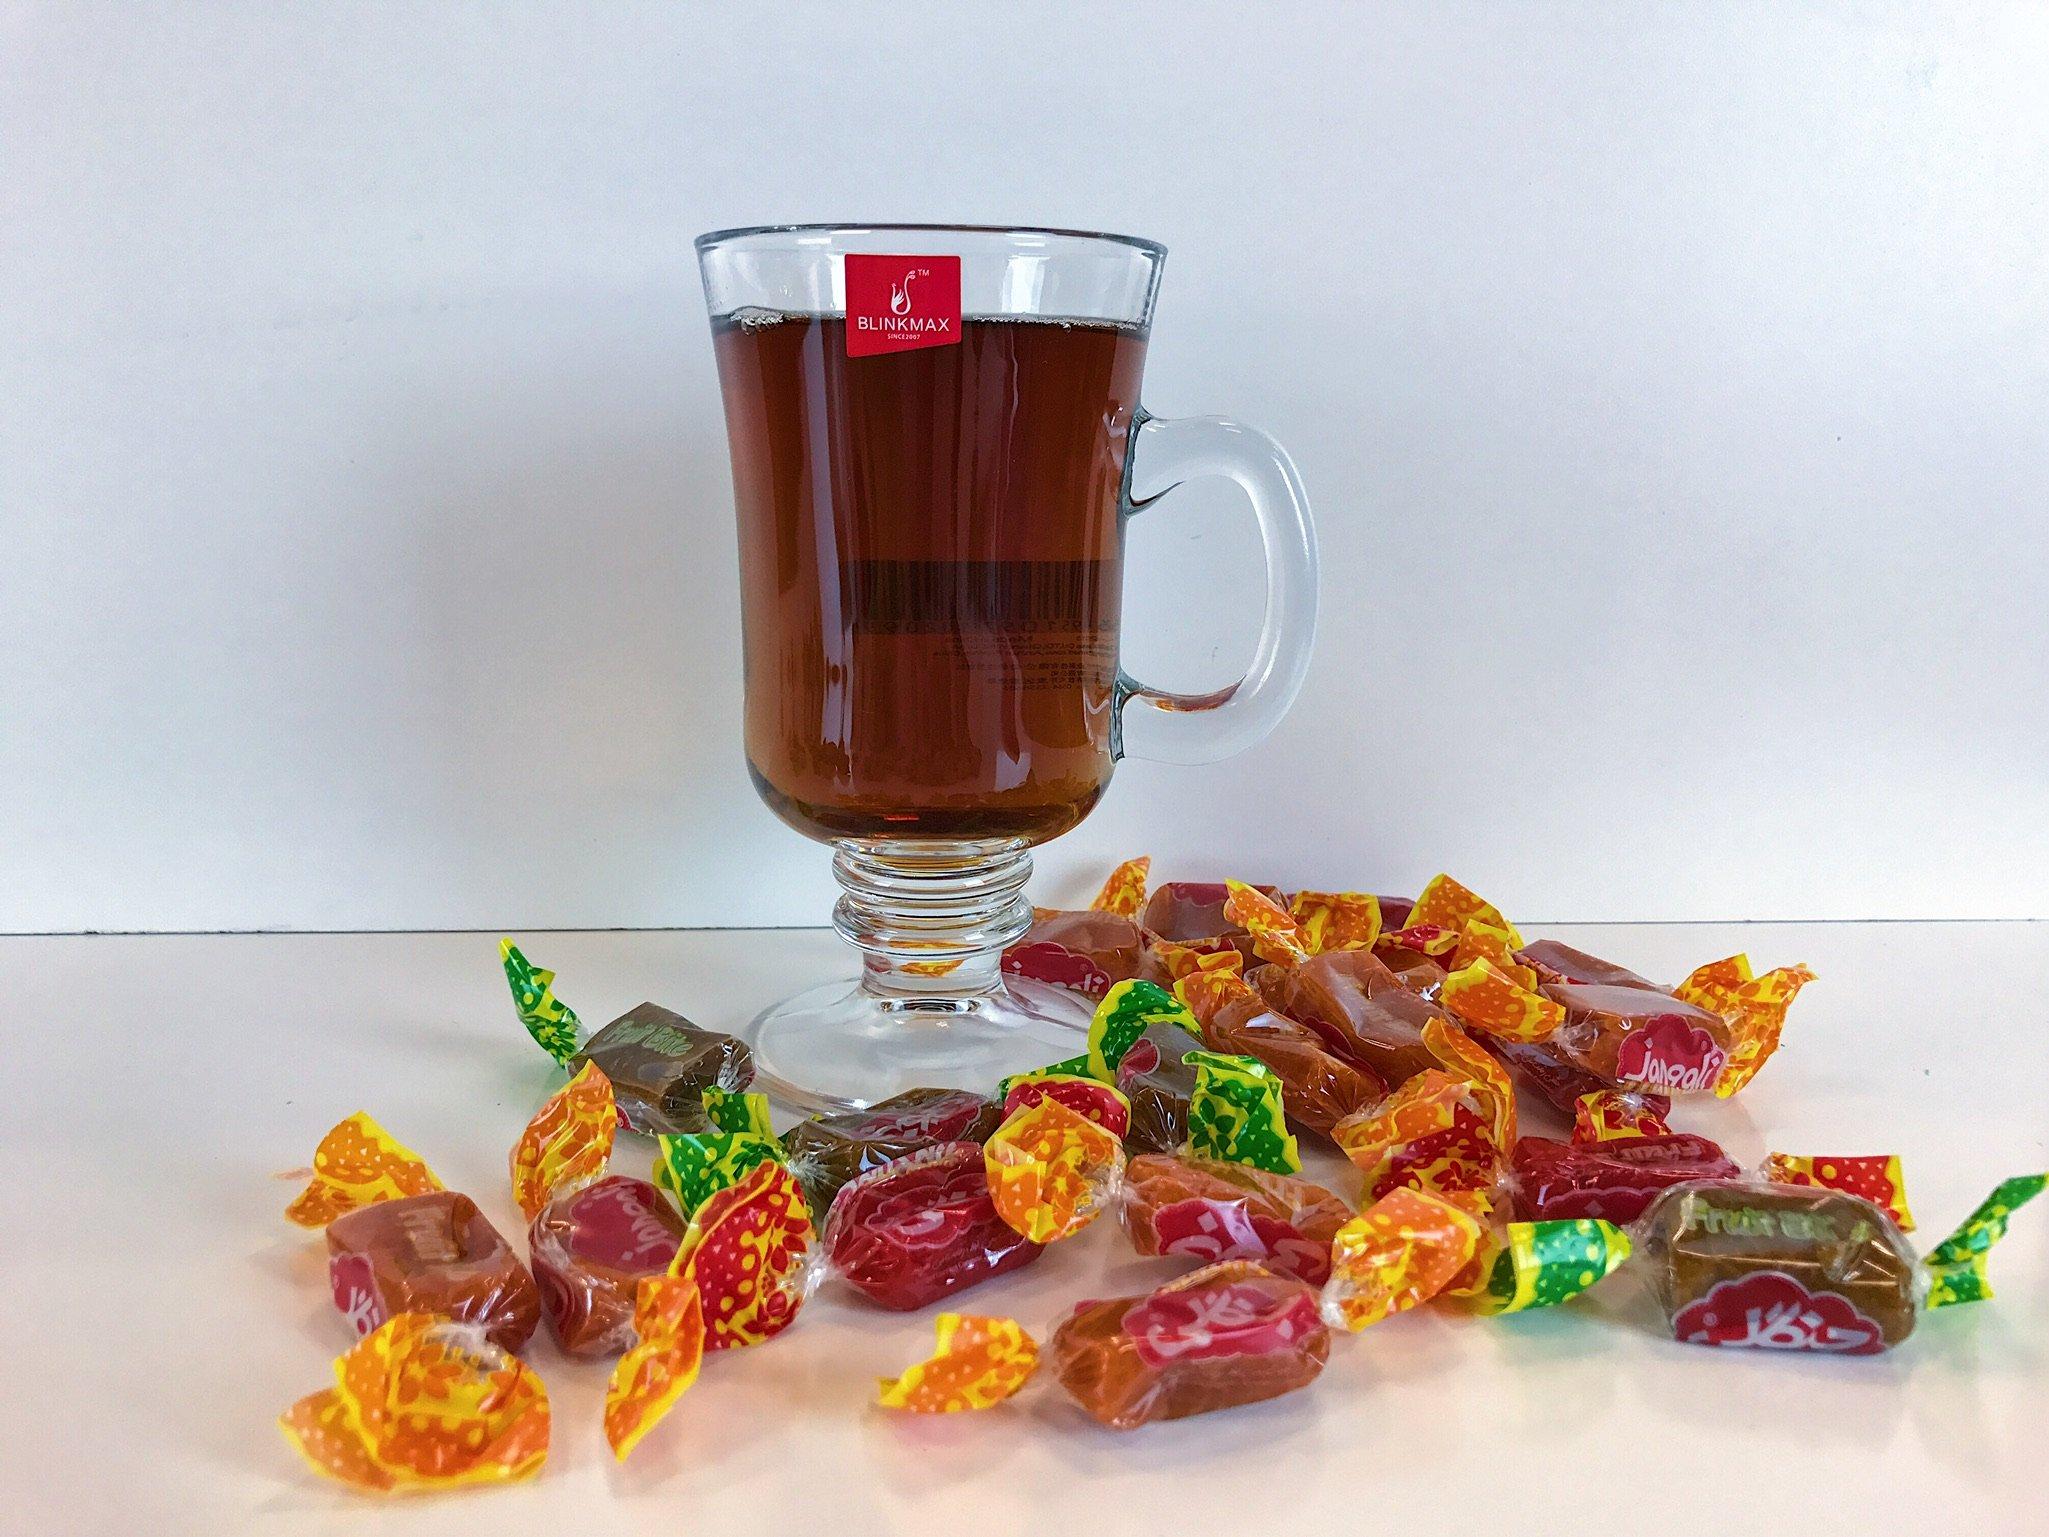 BlinkMax 7.7 ounce (230 ml) Irish Coffee Mug, 4-Piece Set